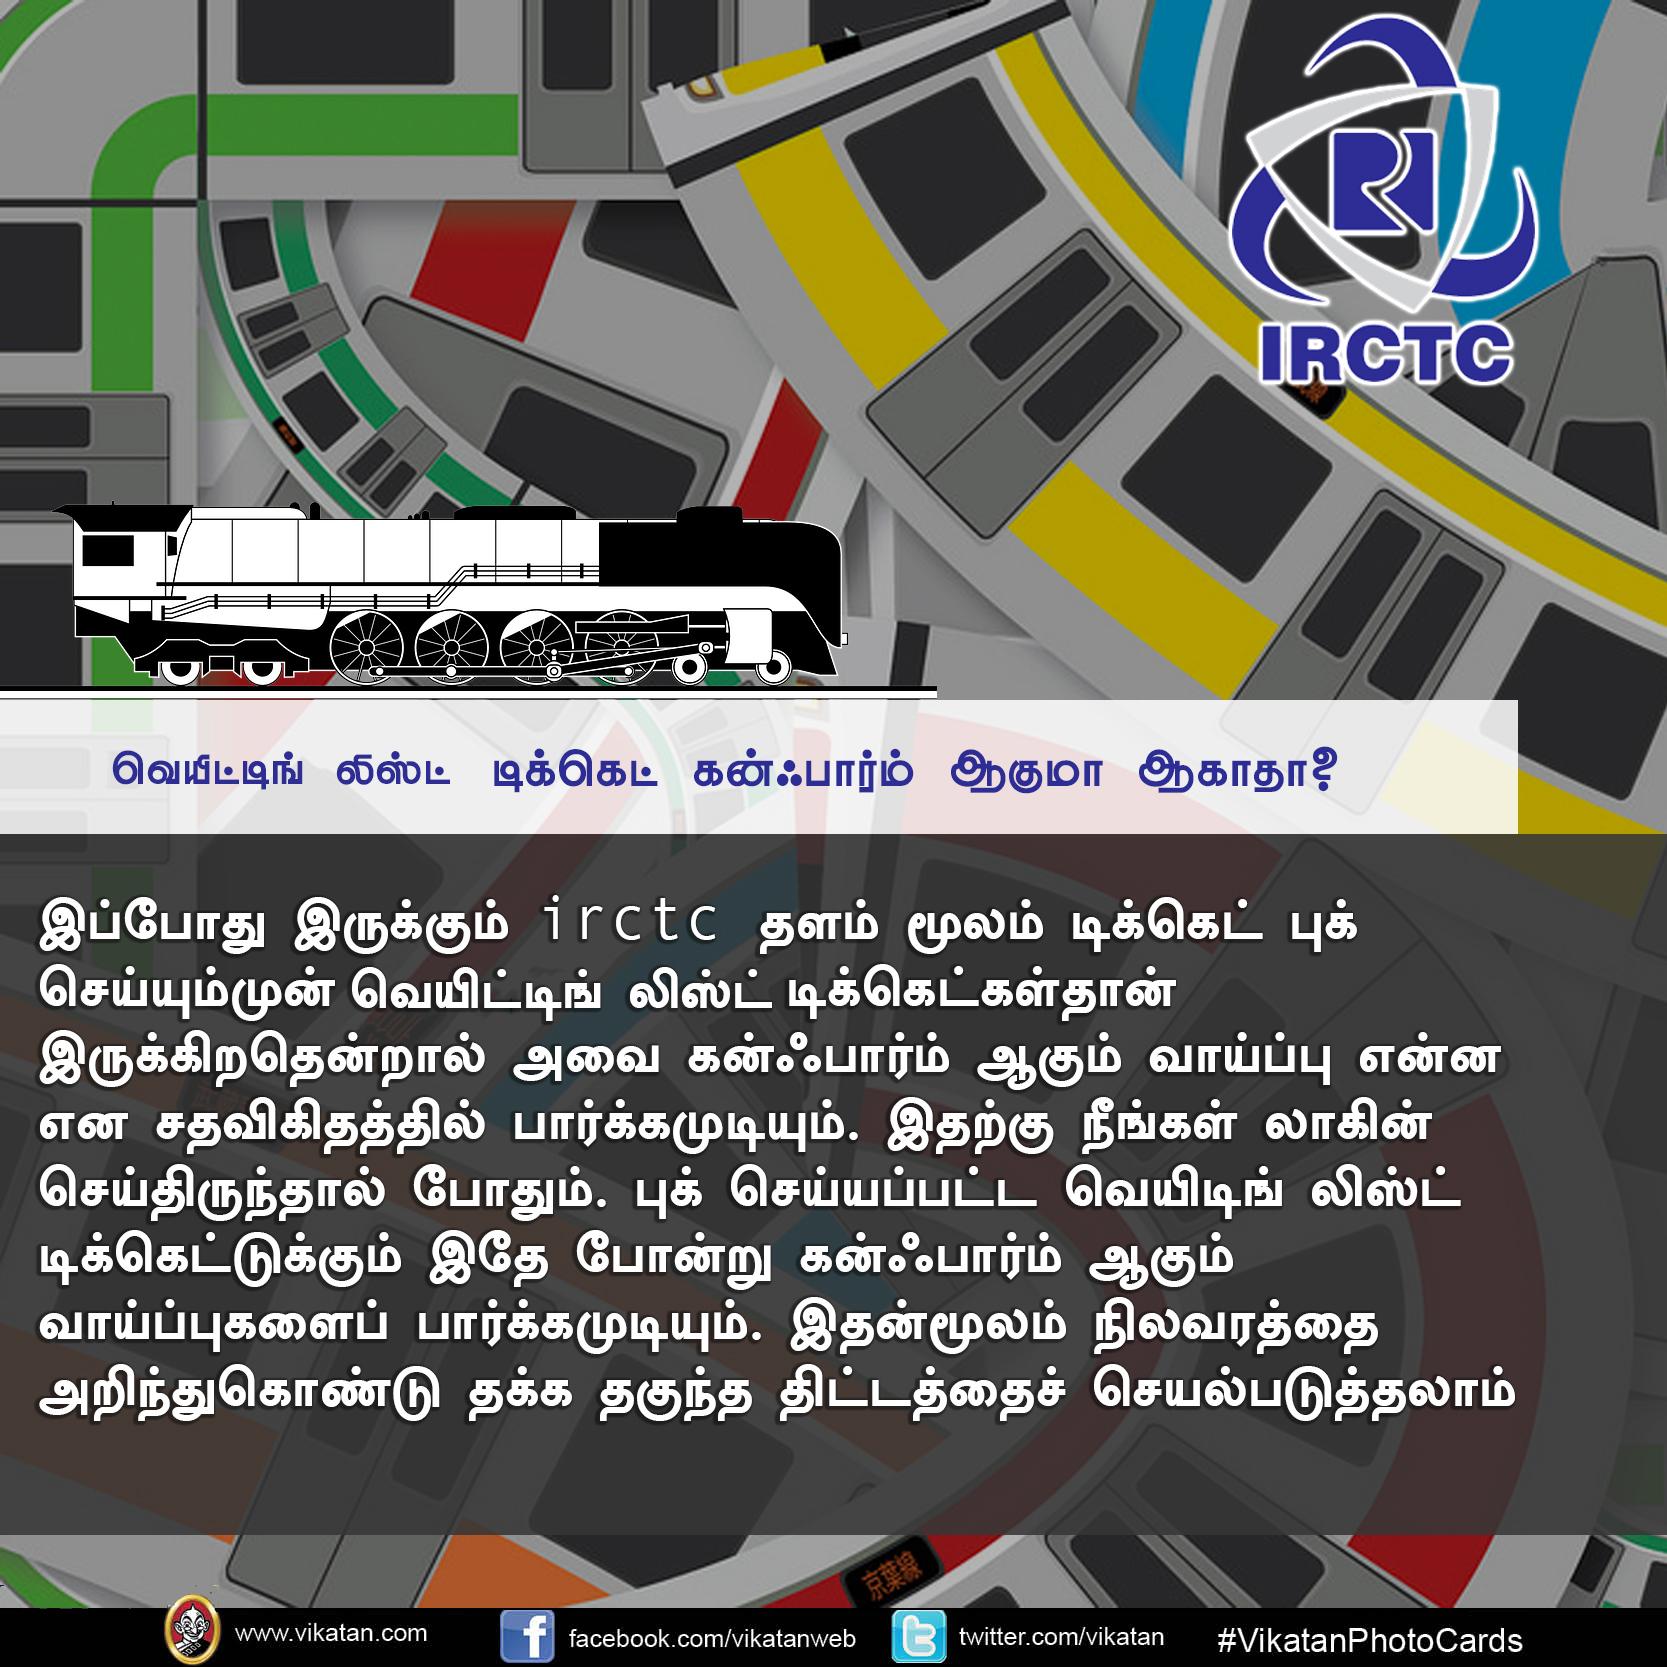 IRCTC-ல டிக்கெட் எடுக்க சிரமப்படுறீங்களா? இதைப் பாருங்க! #VikatanPhotoCards